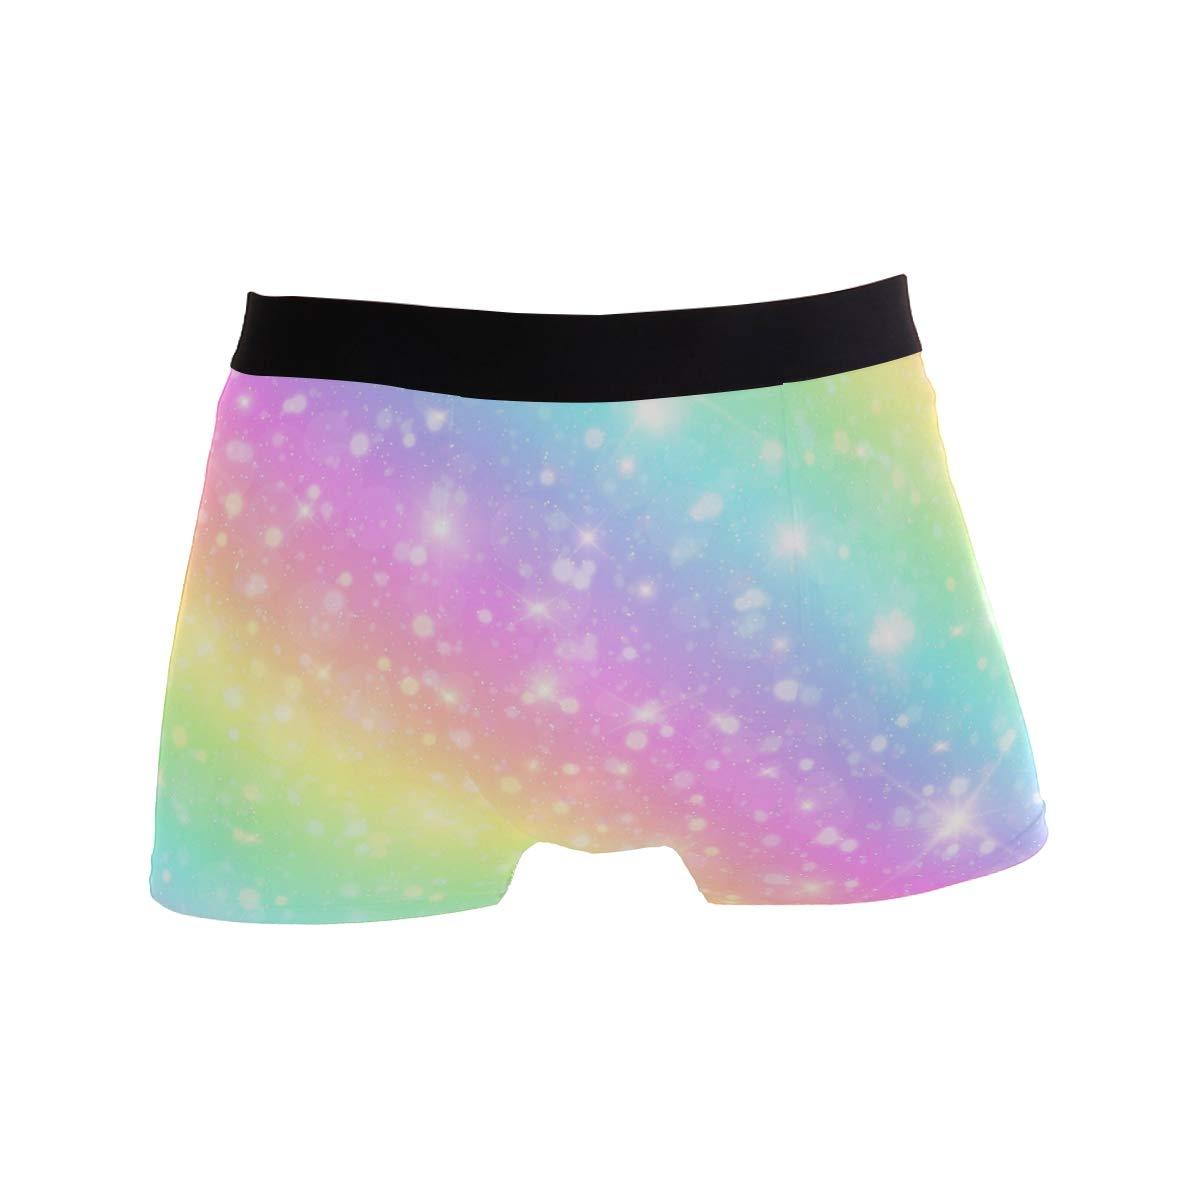 BETTKEN Mens Boxer Briefs Galaxy Rainbow Star Short Underwear Soft Stretch Underpants for Men Boys S-XL